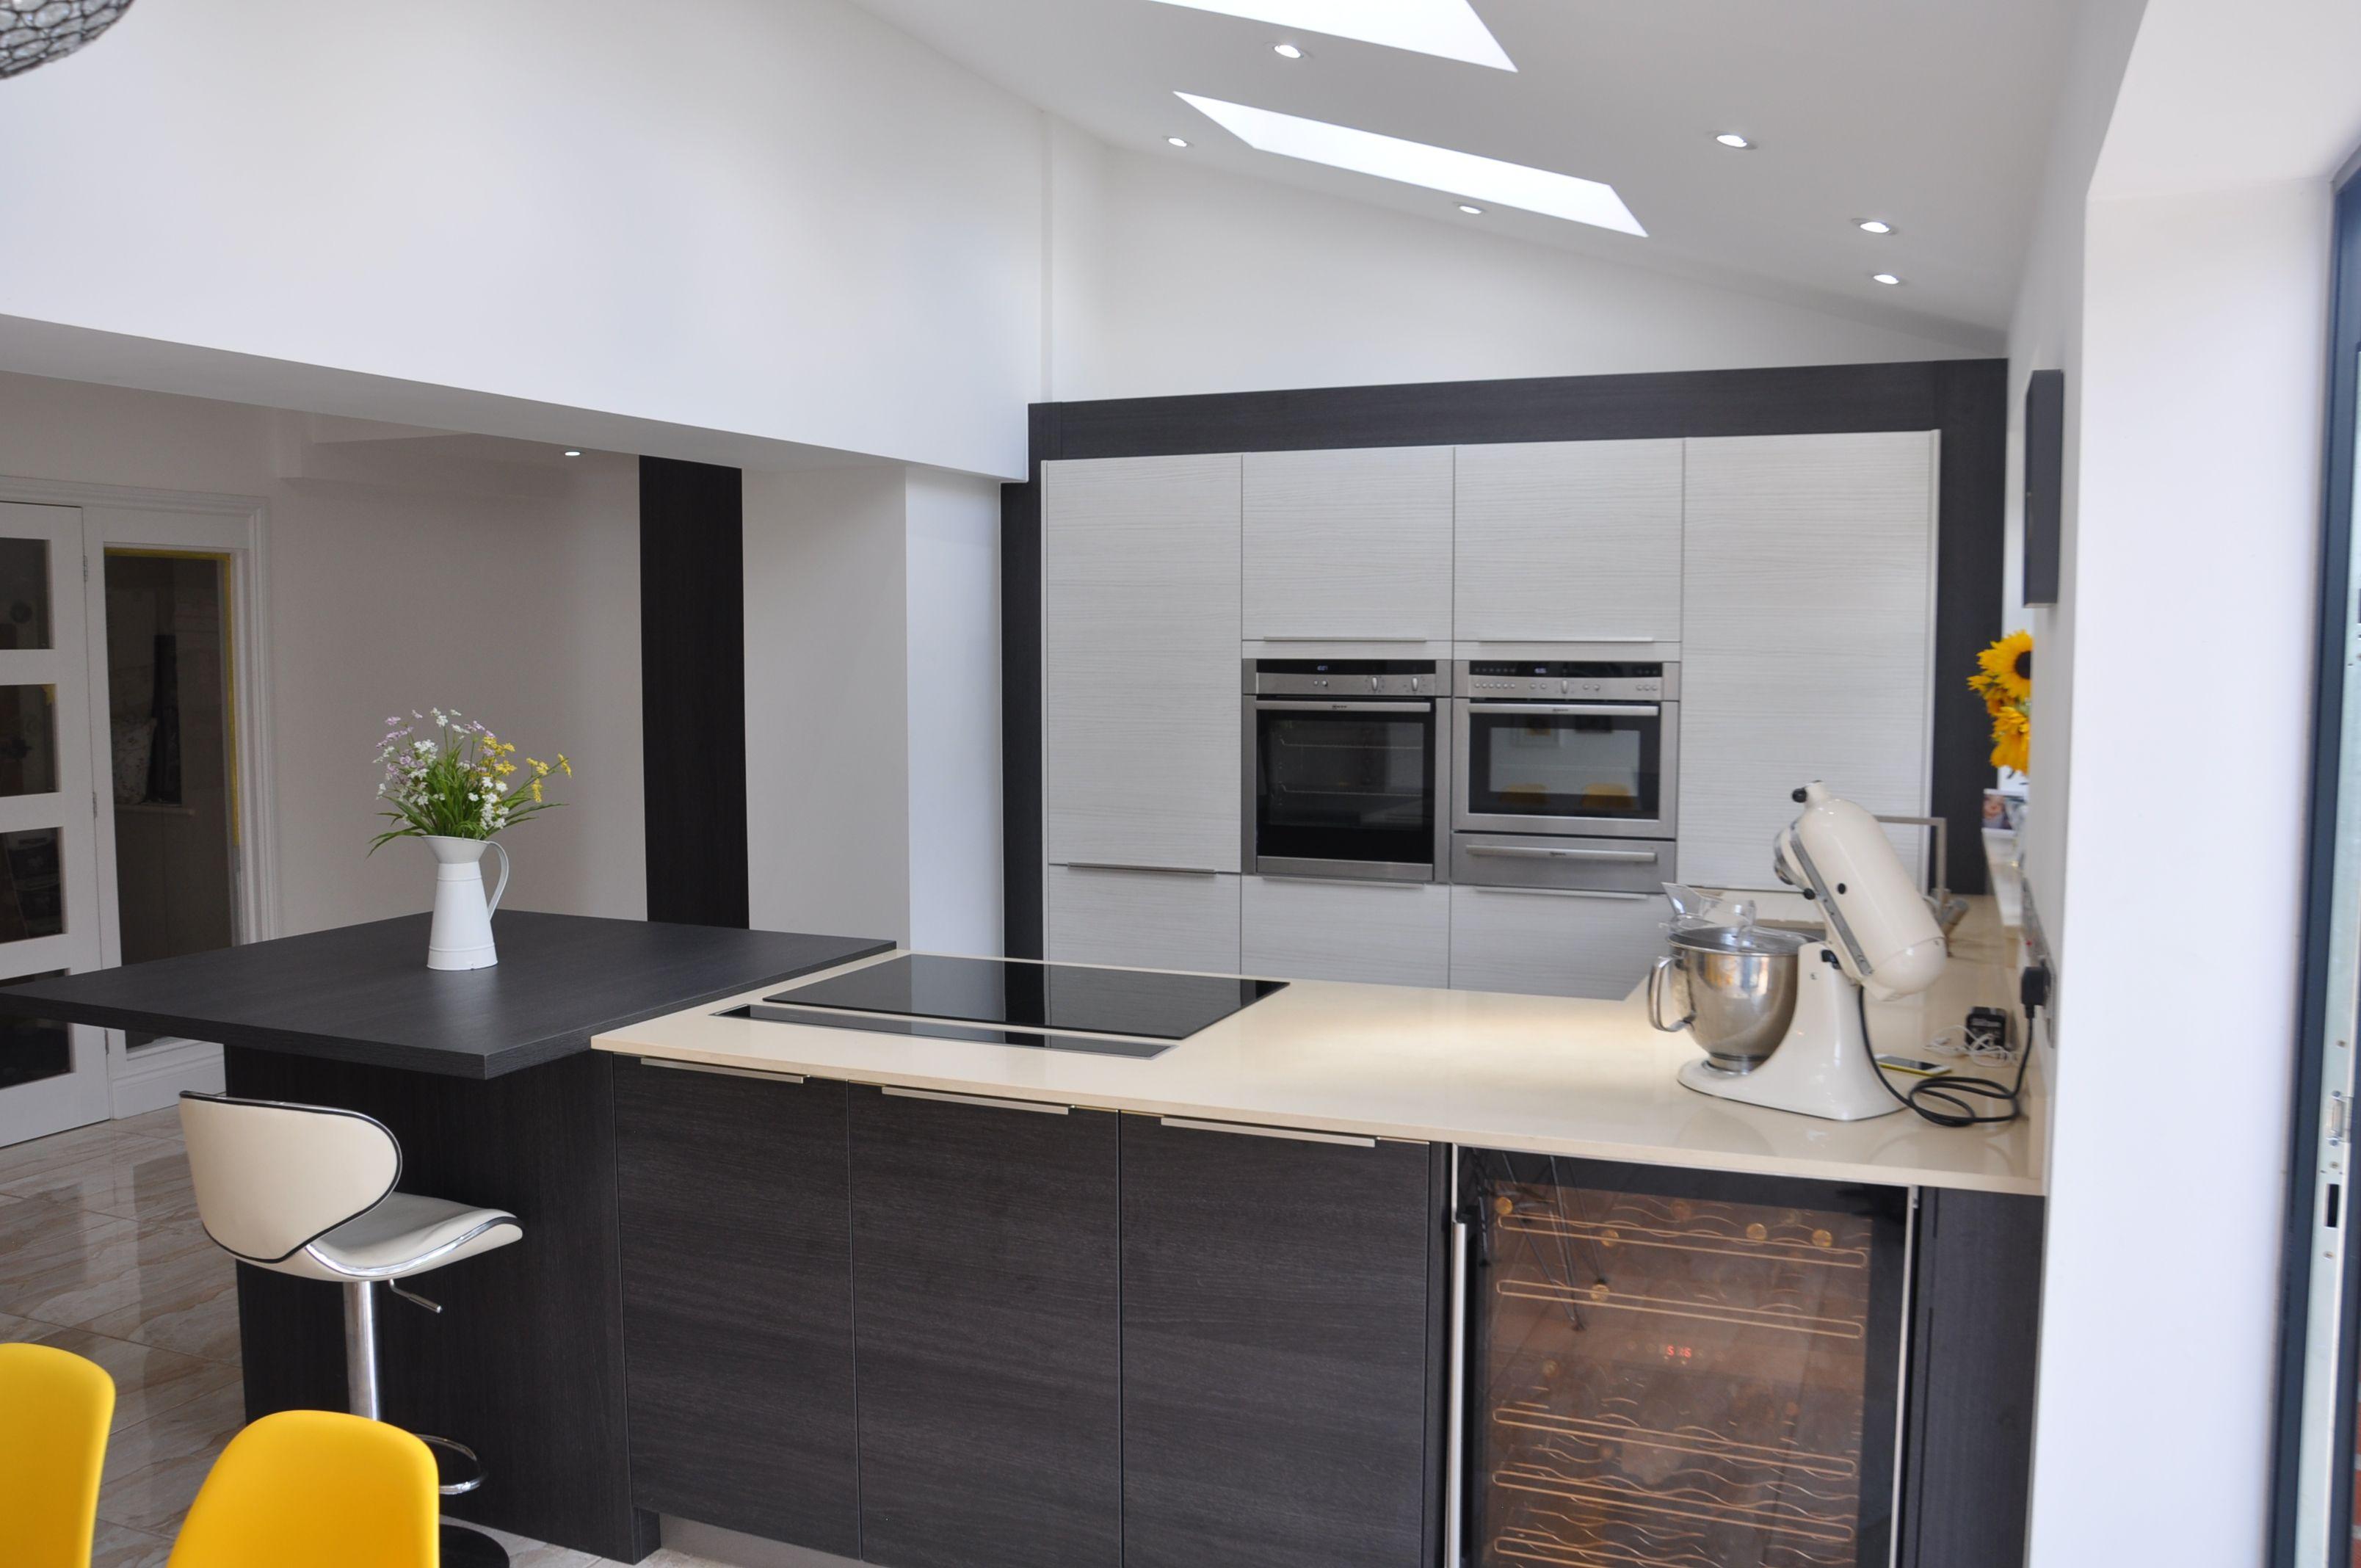 Kitchen Connections Of Ascot. Neff Extra Wide Induction Hob U2013 T41D8X2. Neff  Downdraft Hood